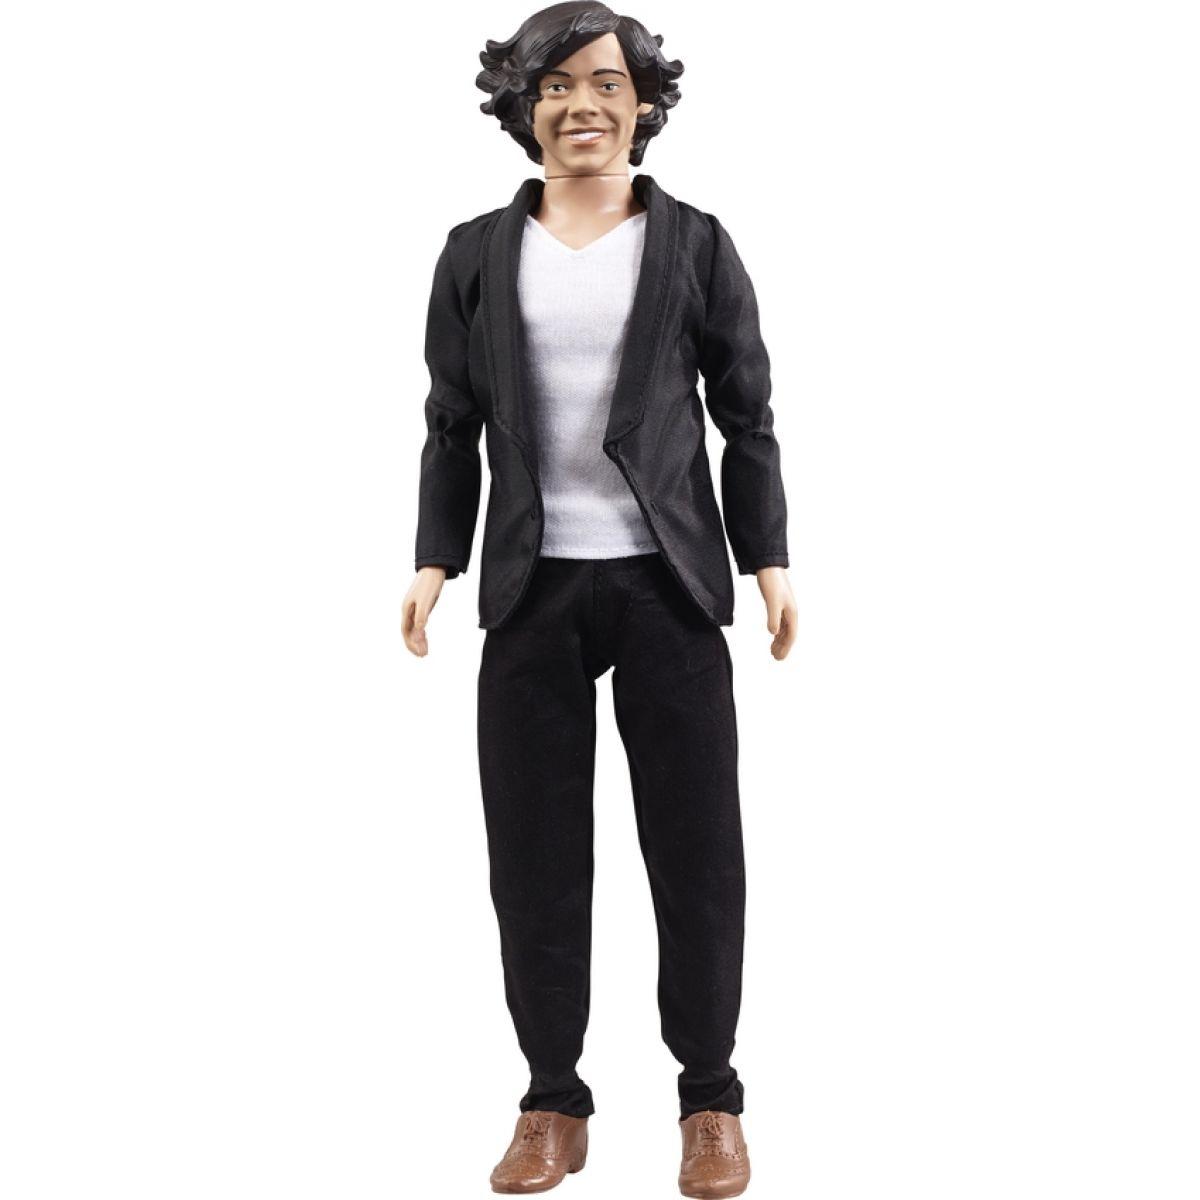 Vivid One Direction figurky - Harry